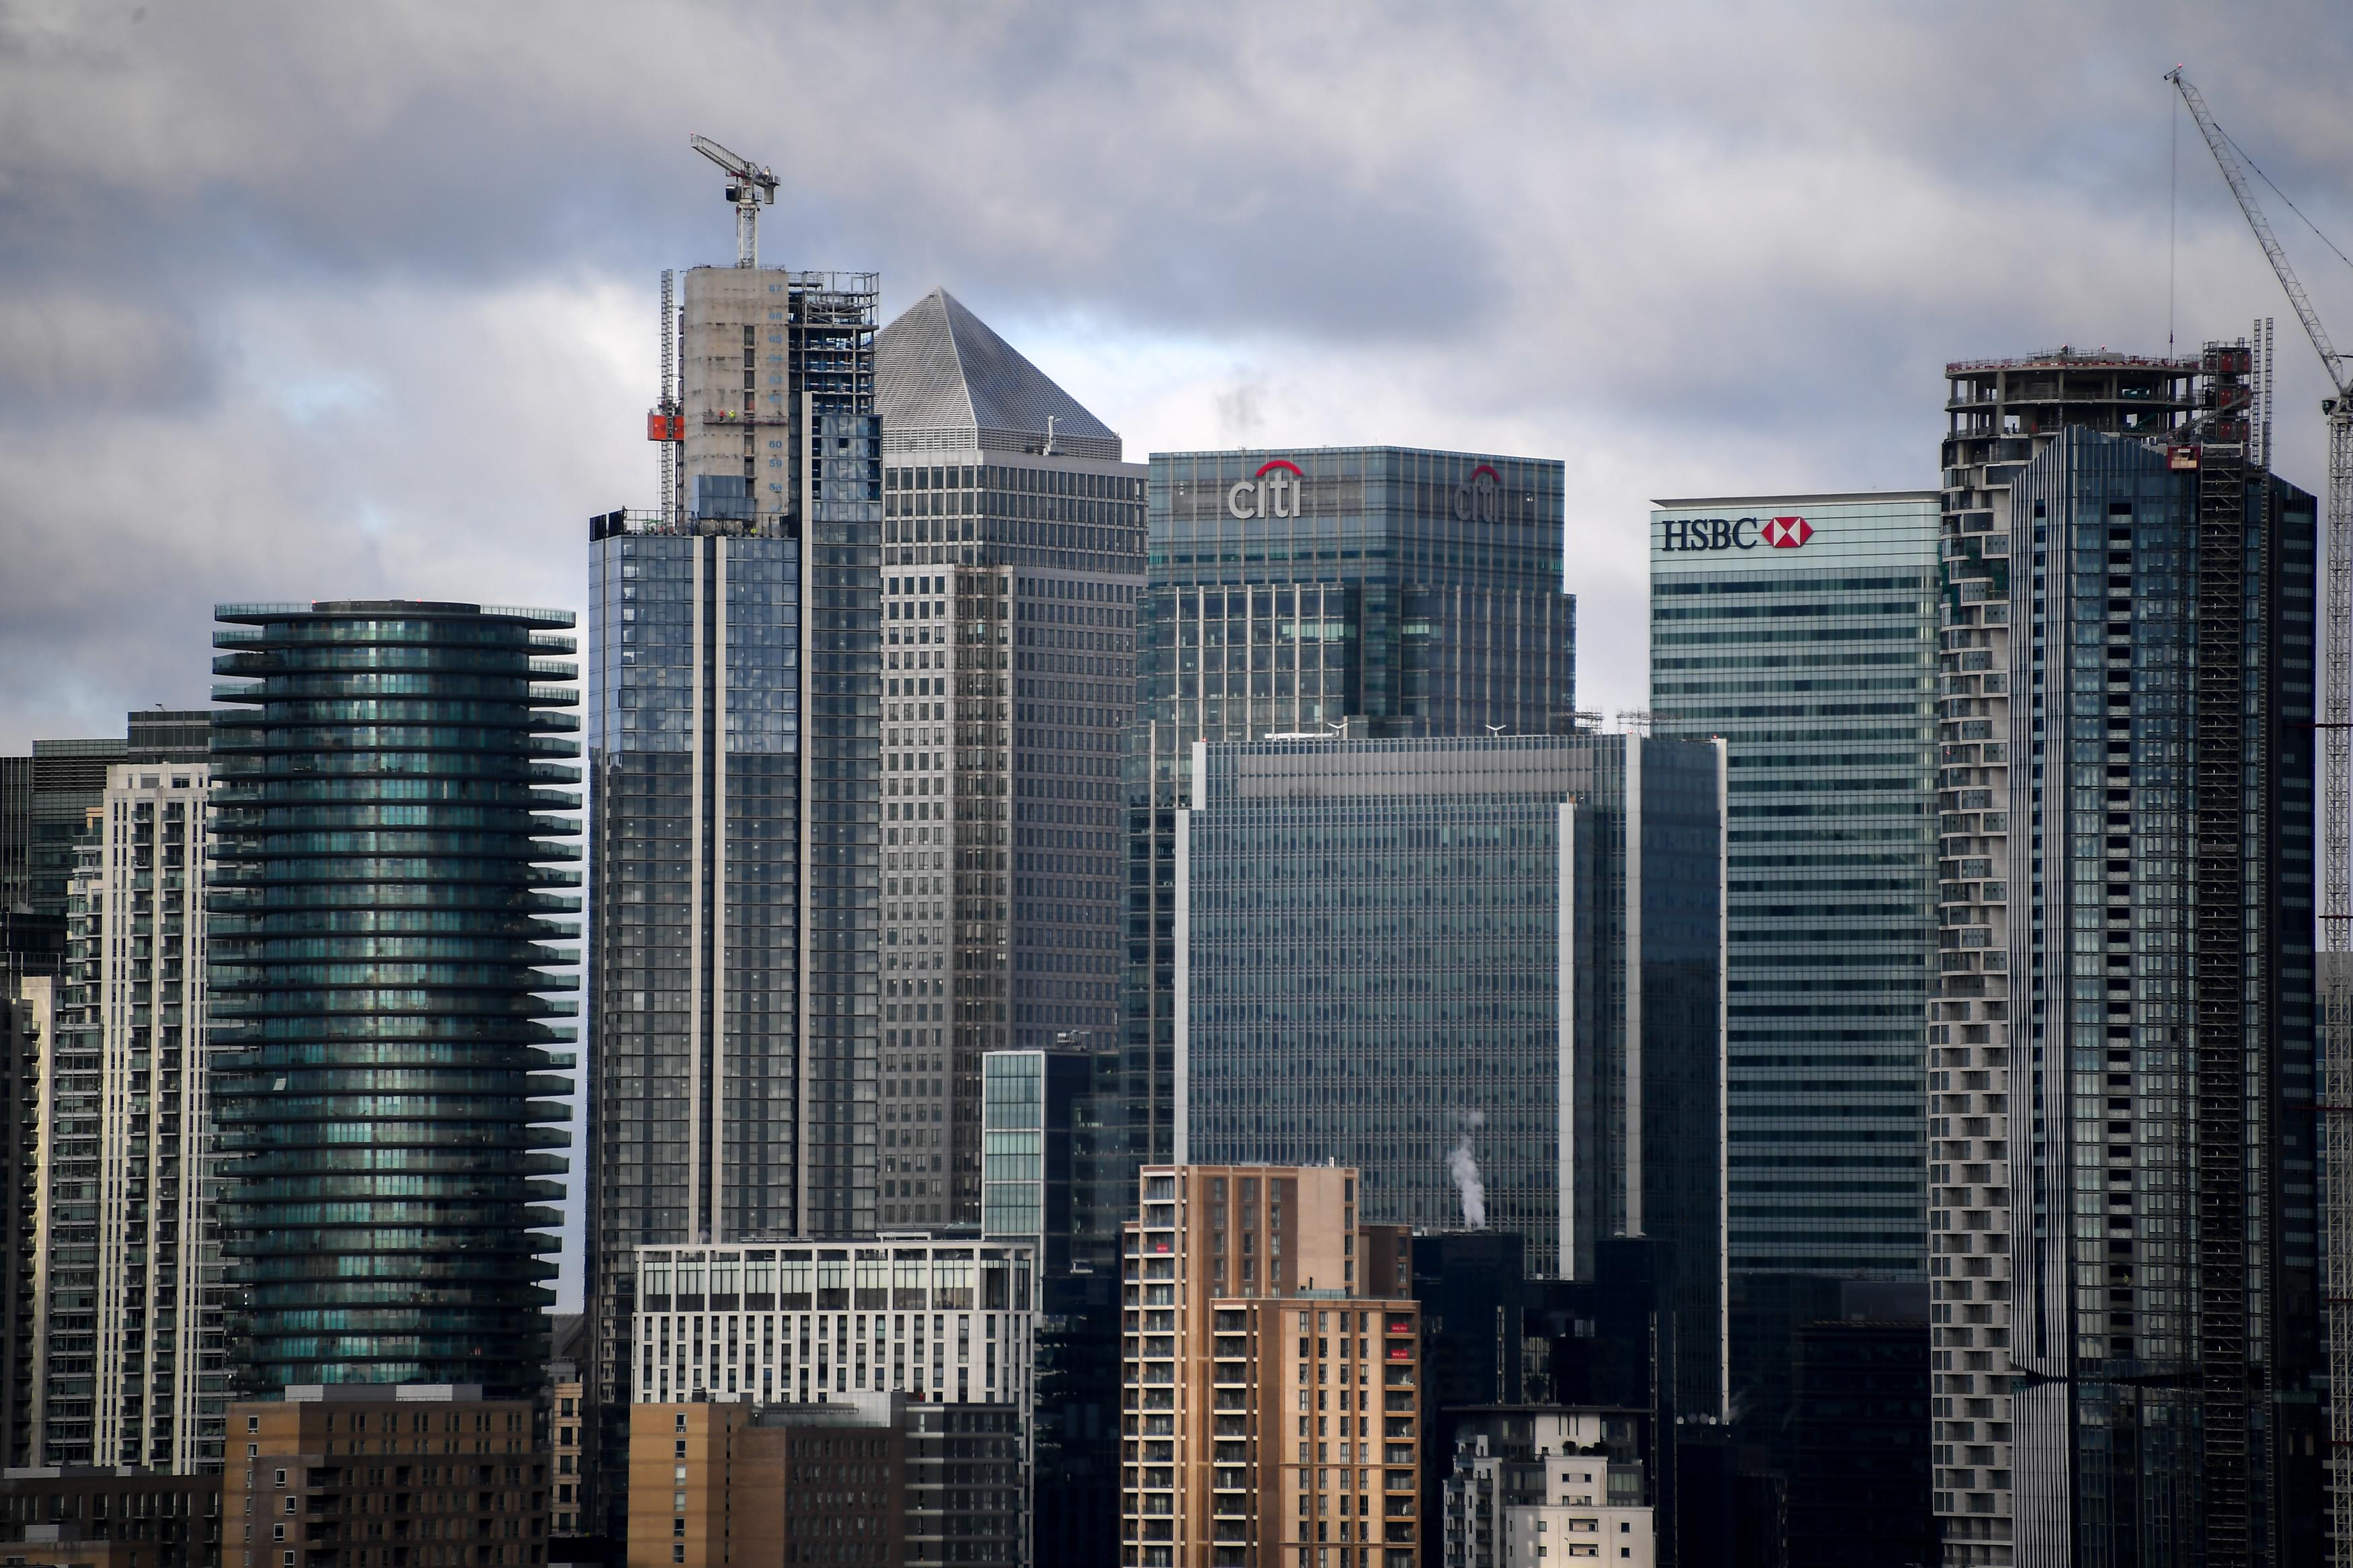 Oil giant Chevron sends 300 London workers home on coronavirus fears